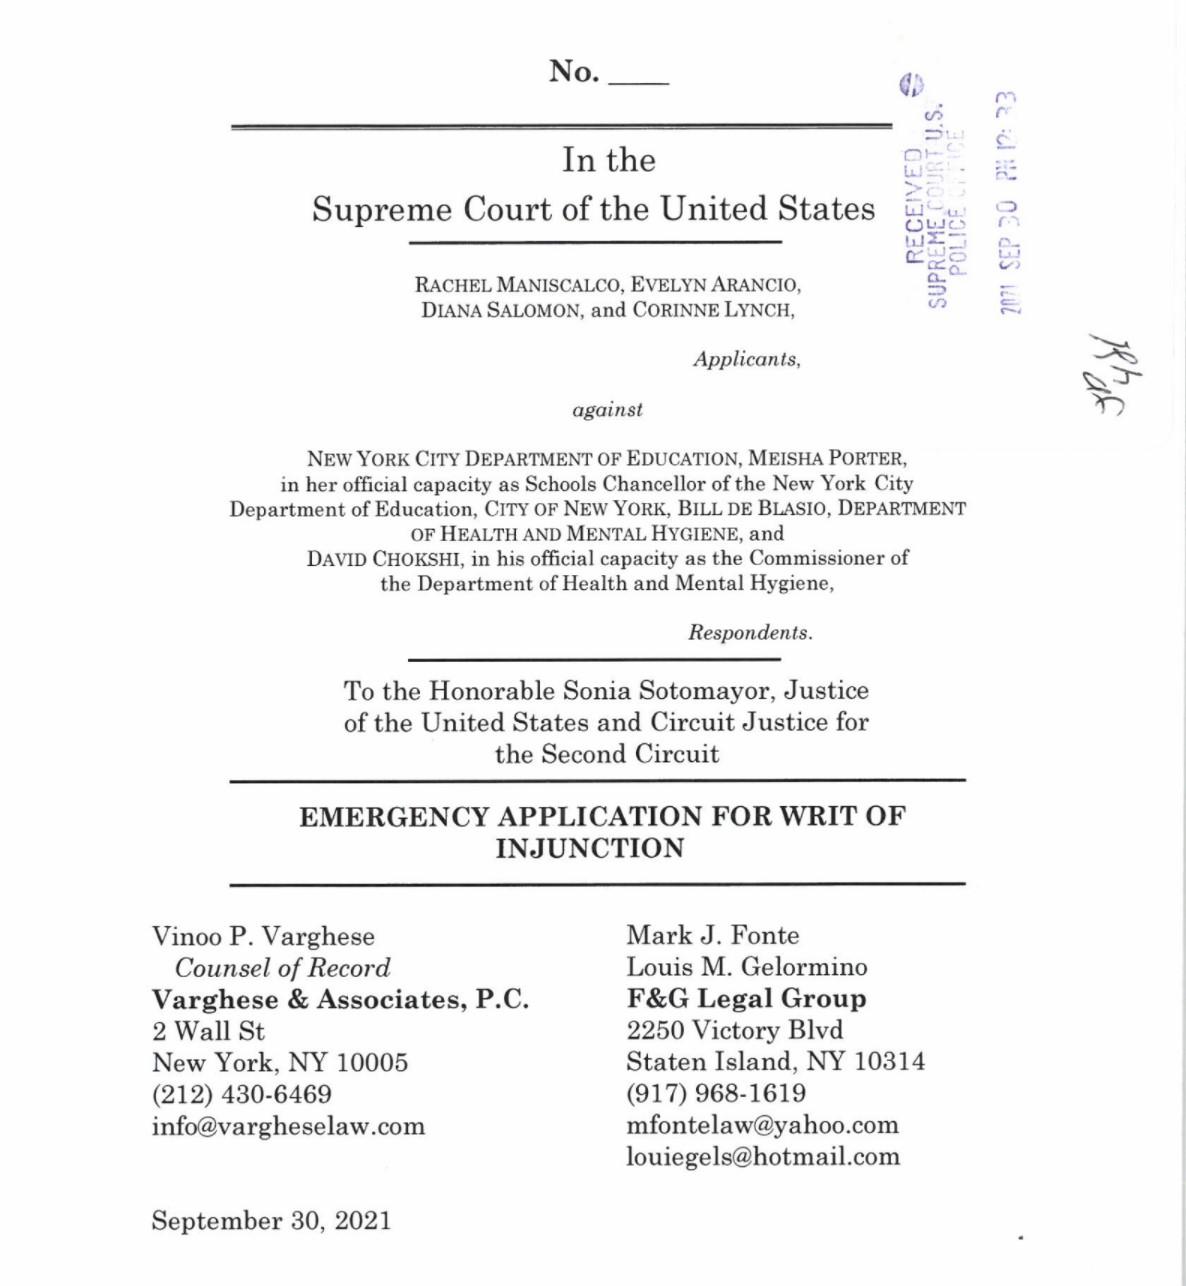 Supreme Court Filing